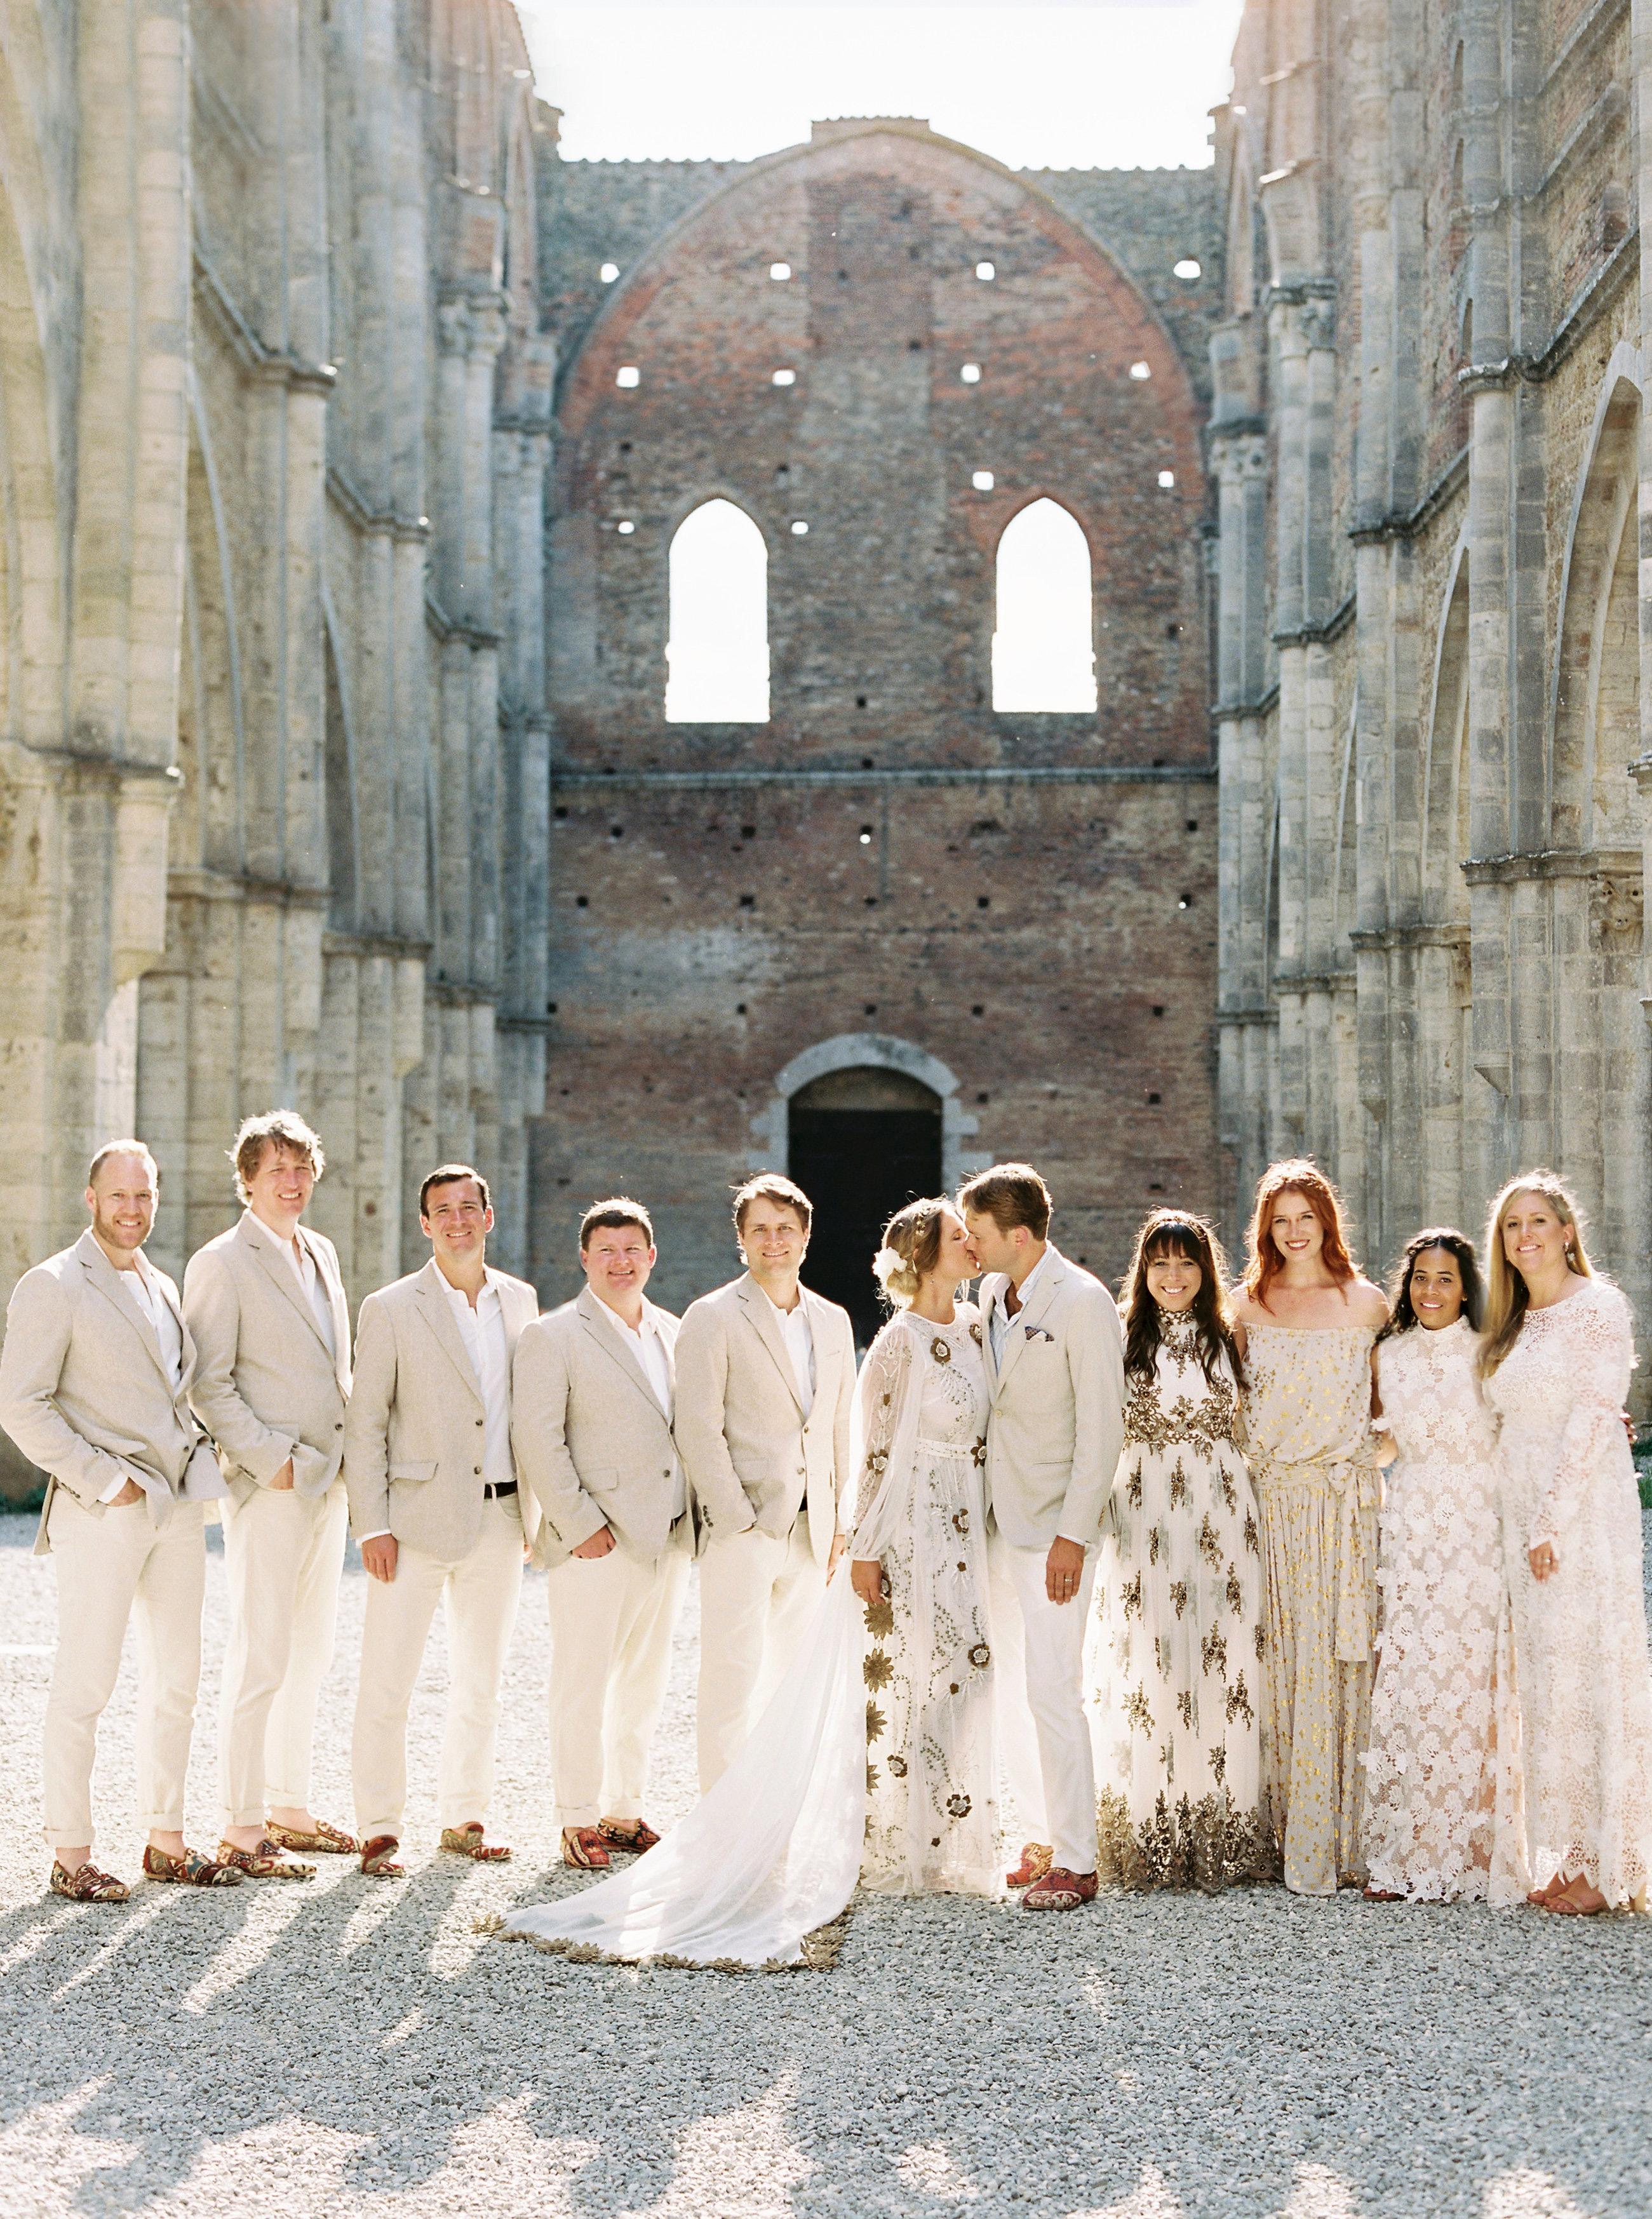 alexis zach wedding italy bridal party